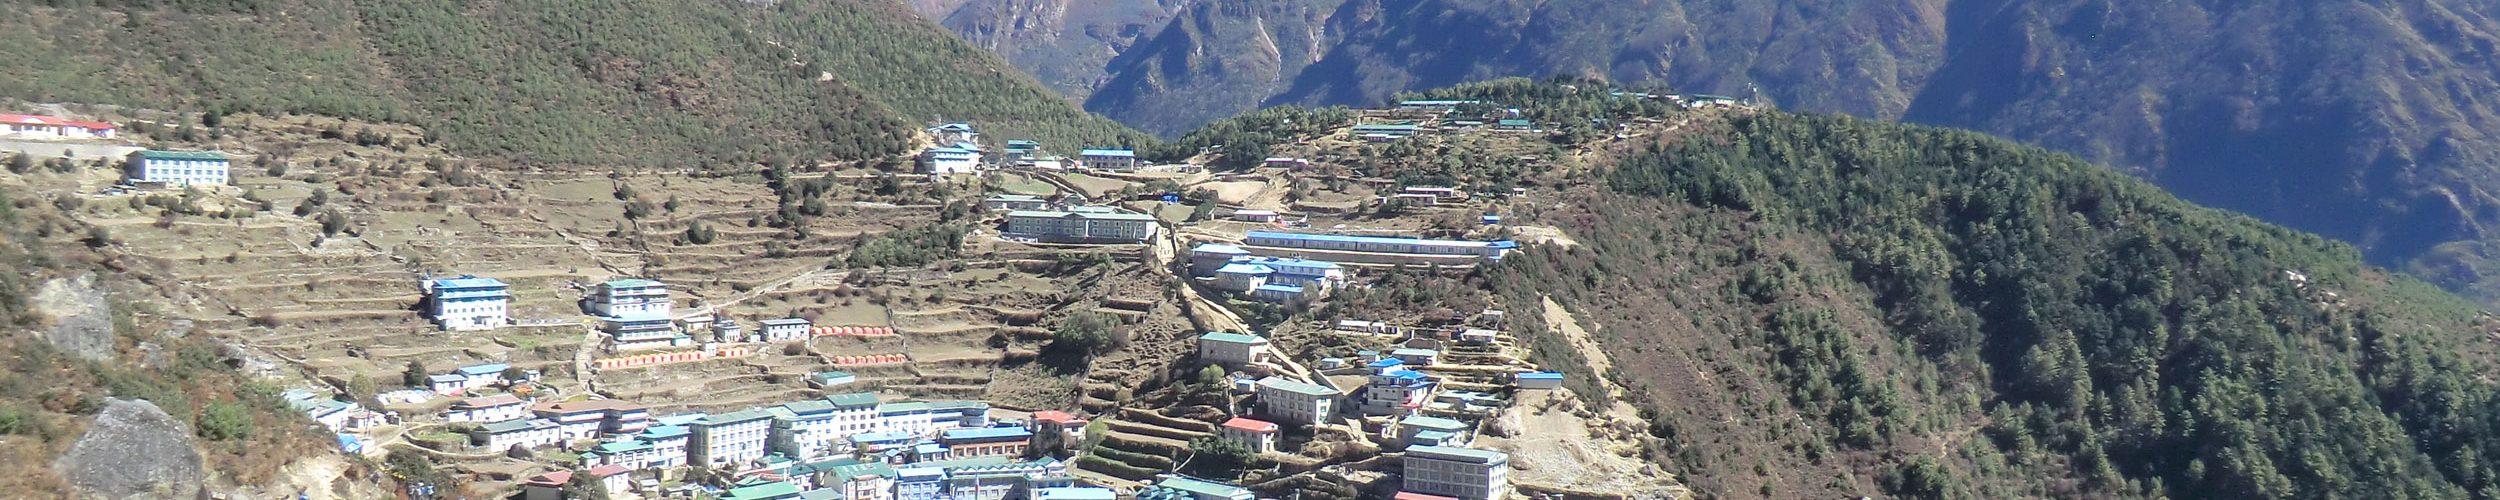 Gokyo dalen Nepal trekking